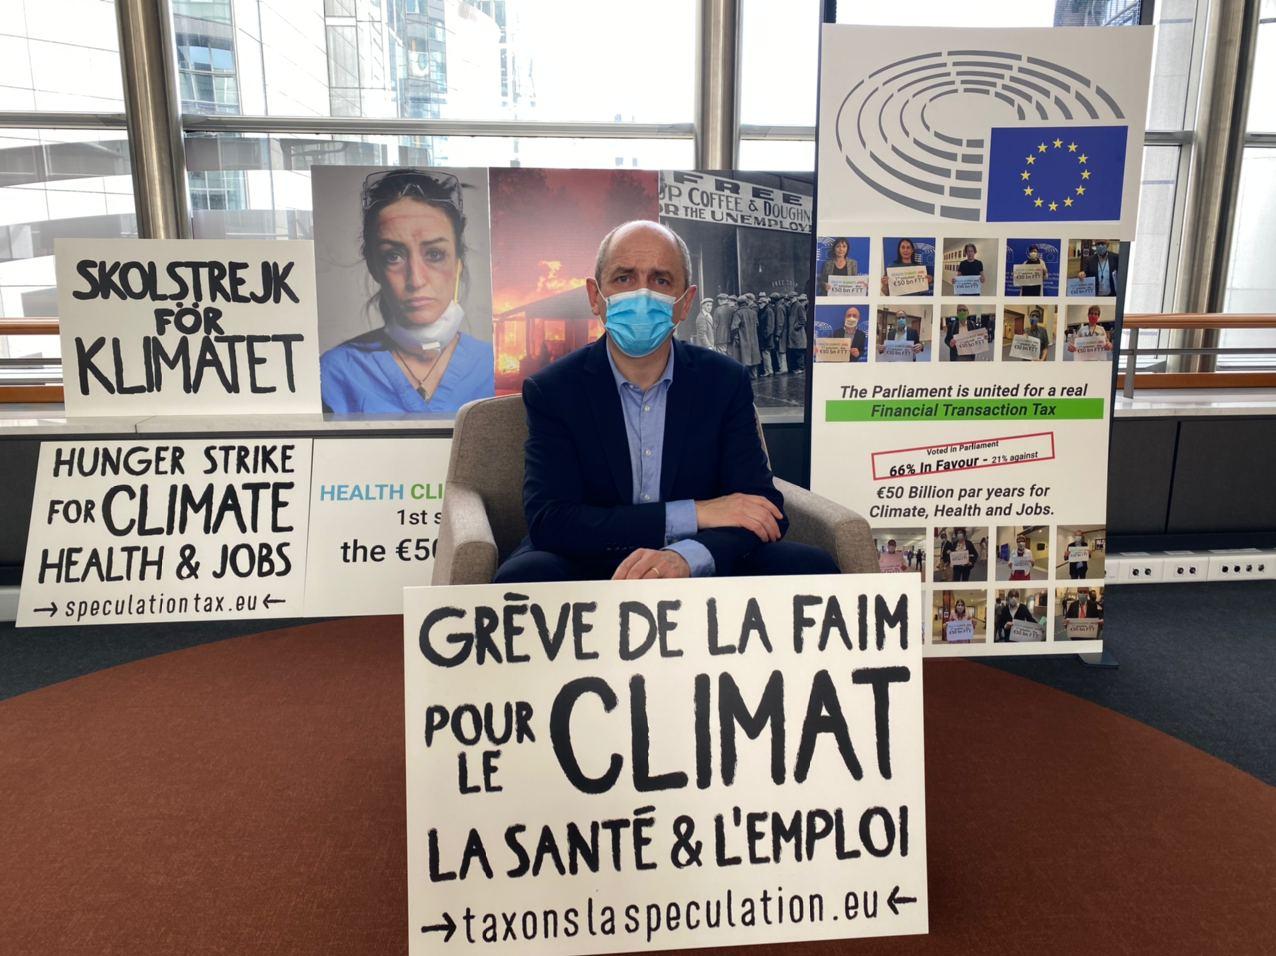 Депутат Европарламента объявил голодовку